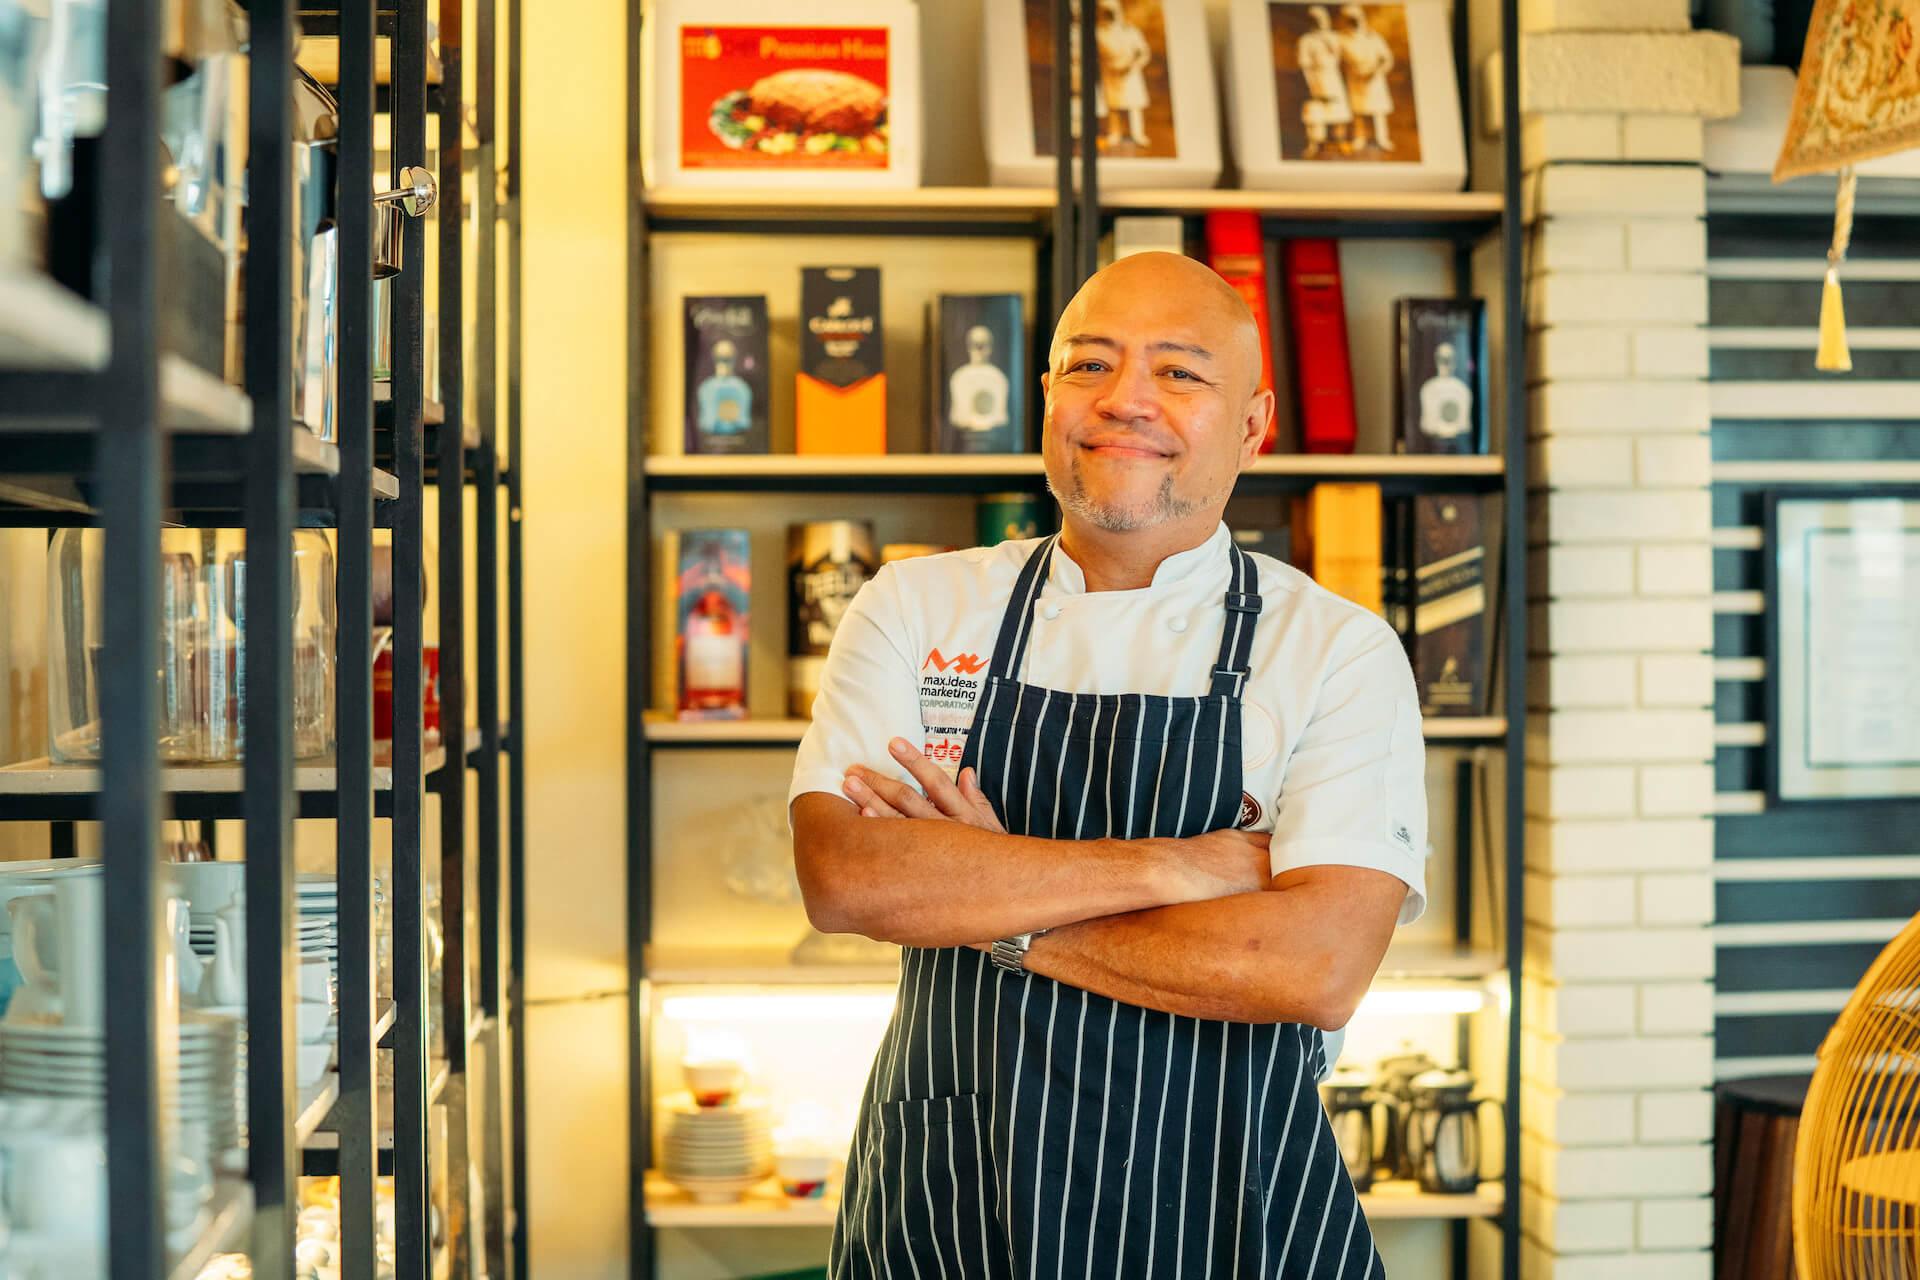 Menoy Gimenez of Tito Chef Restaurant Parañaque